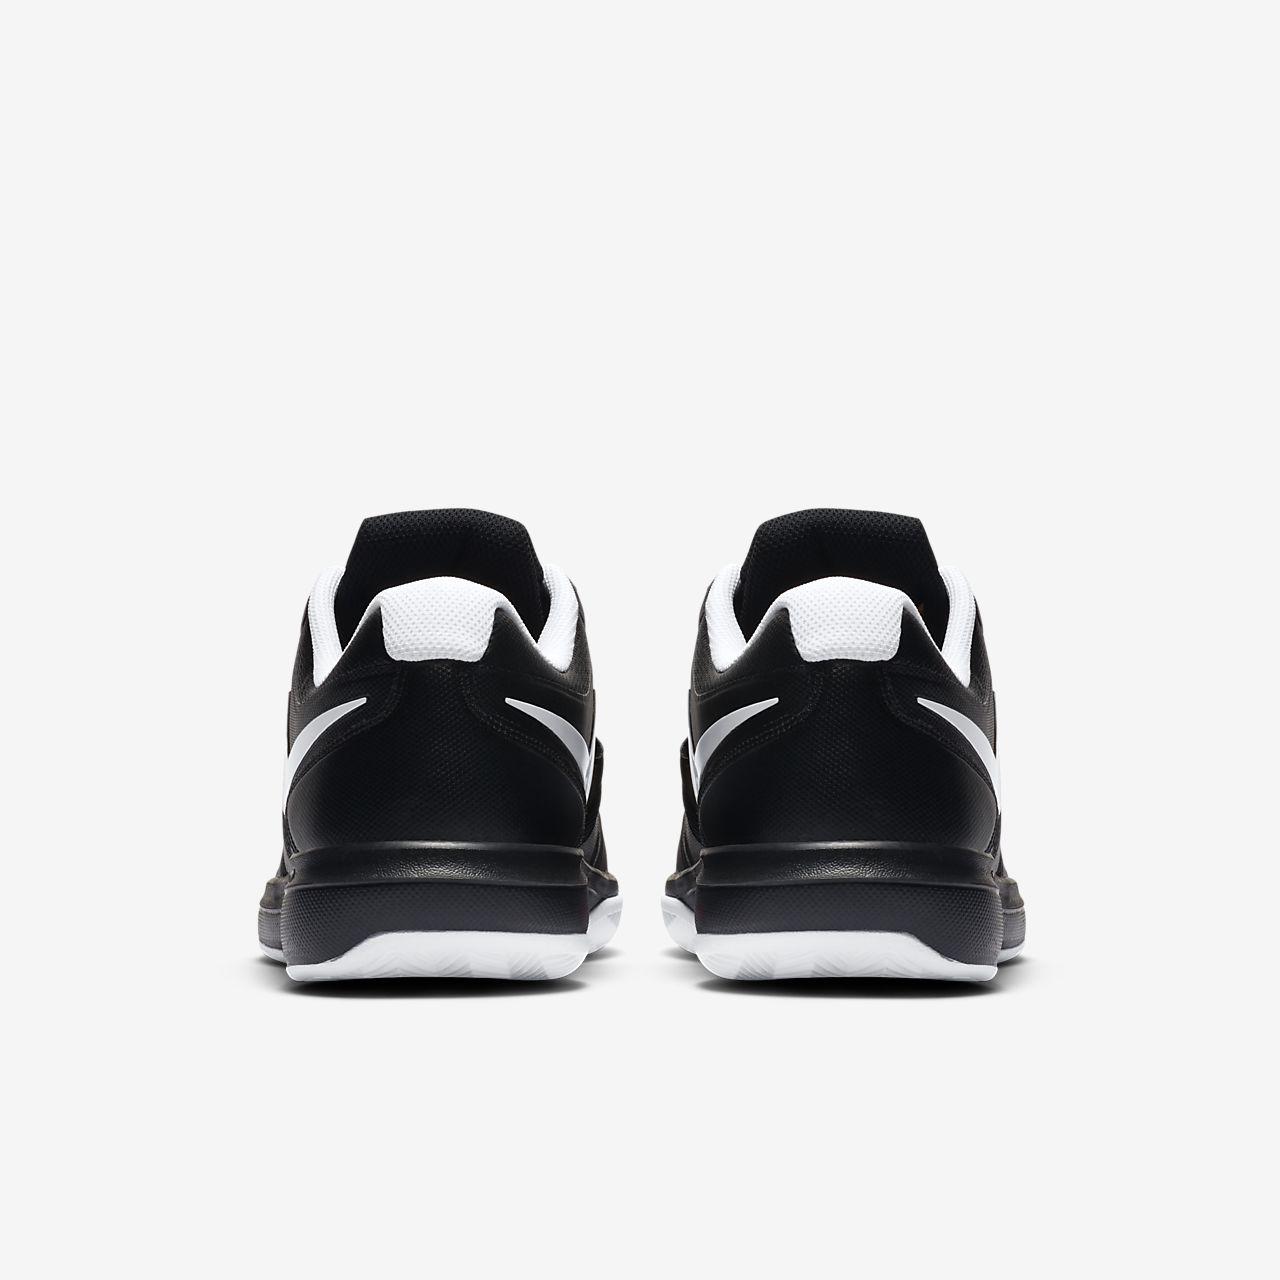 8642756f5d4f Nike Air Zoom Prestige Clay Men s Tennis Shoe. Nike.com GB